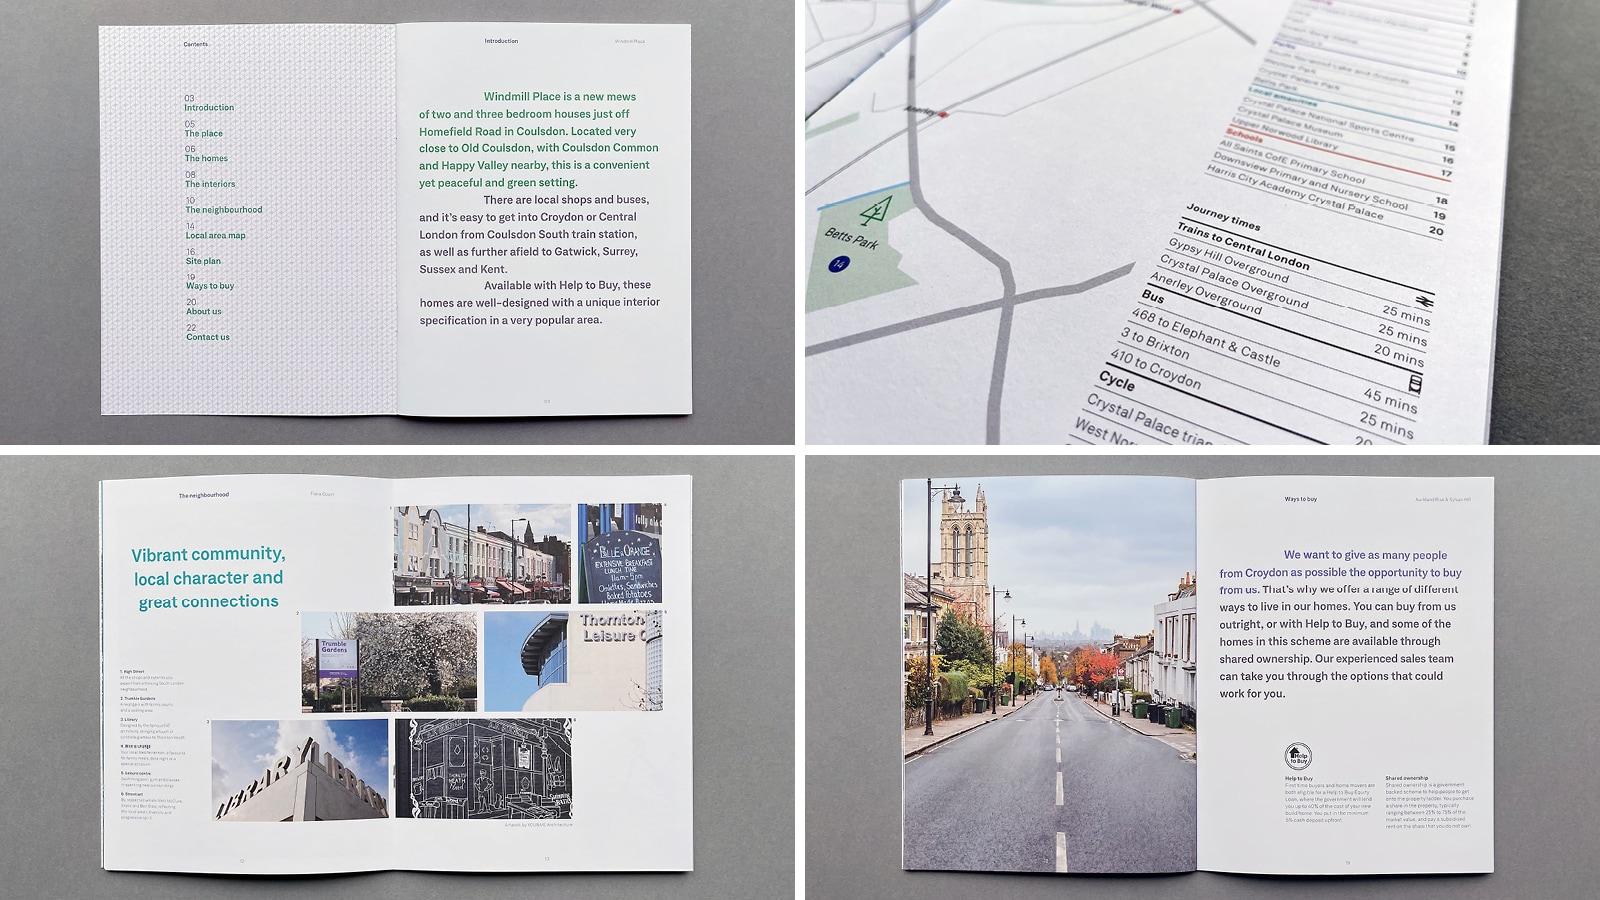 property-architecture-branding-communication-sales-brochure-design-milton-keynes-london3